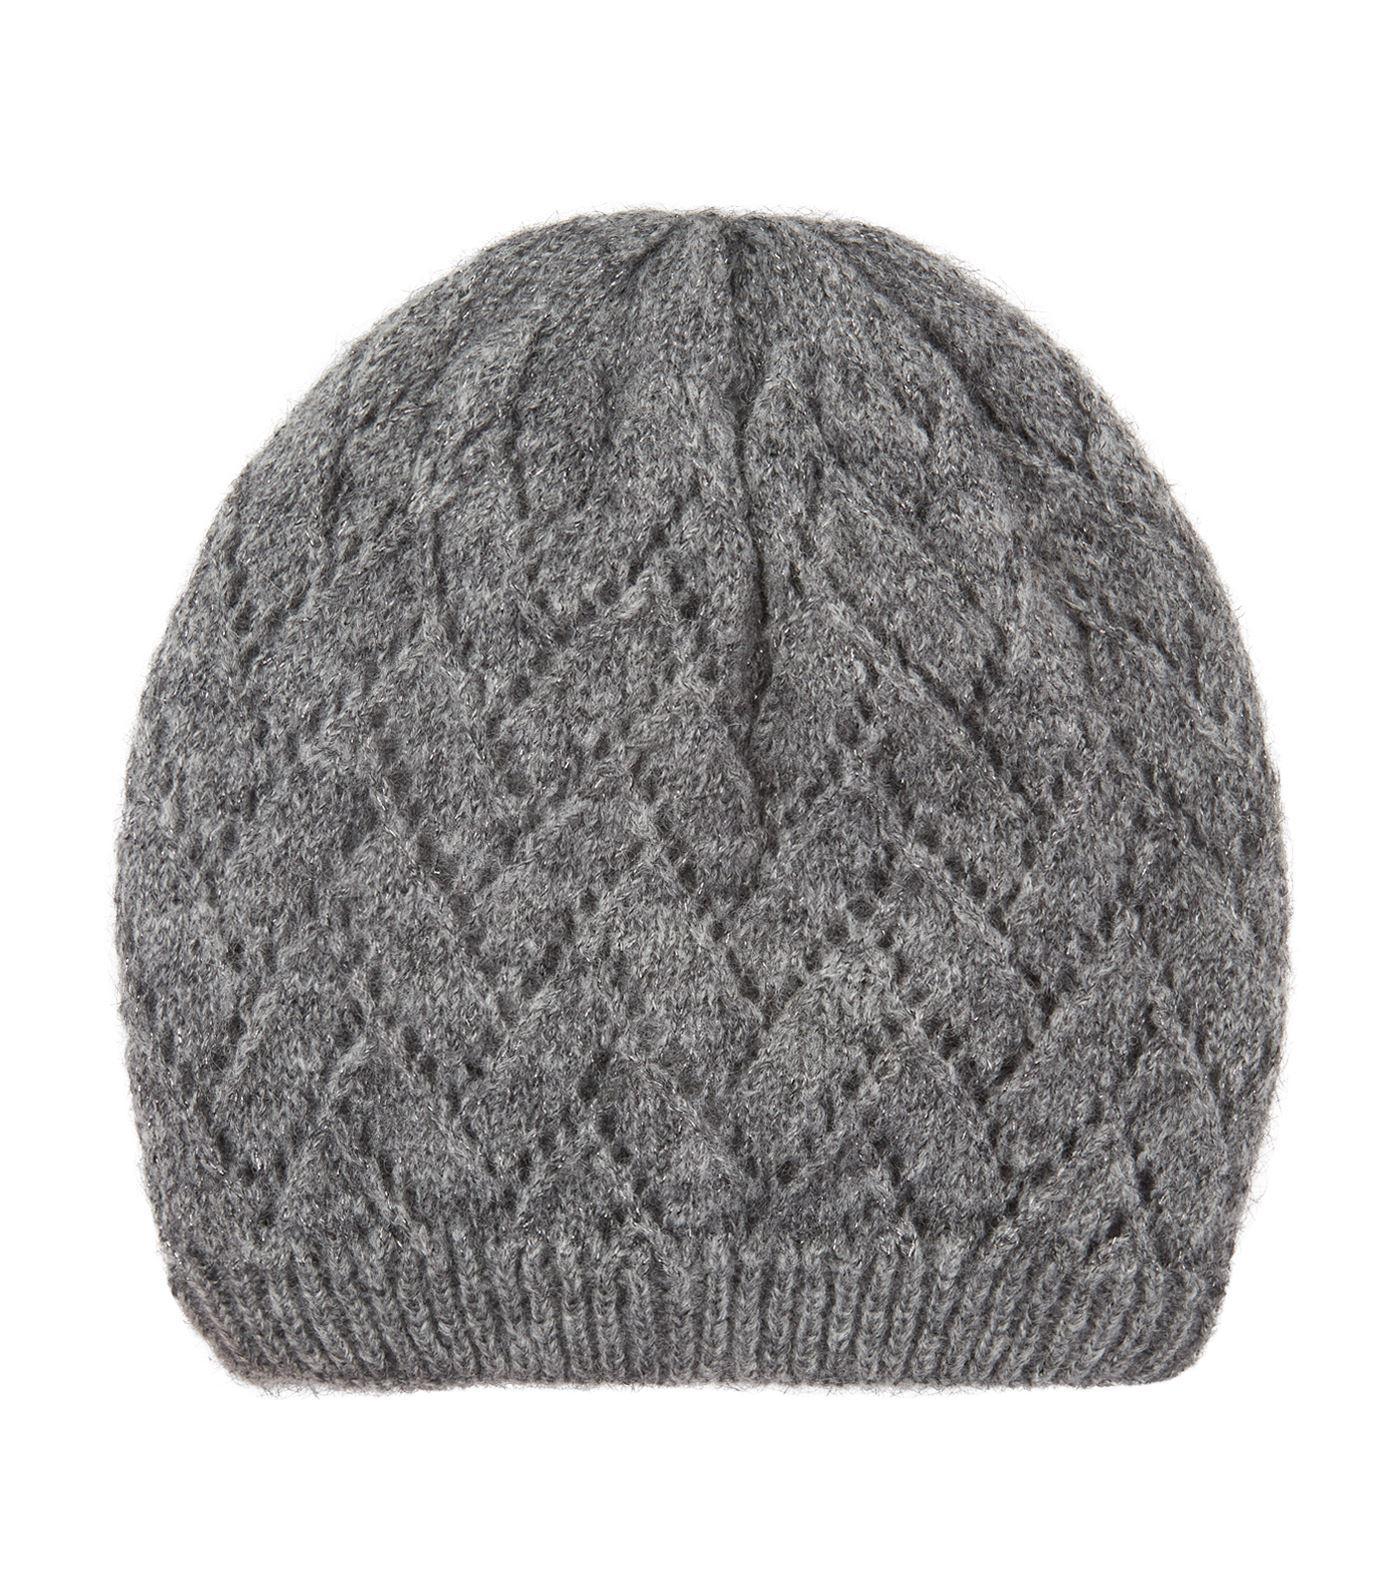 2ecf58c9cf7 Sandro Shimmer Beanie Hat in Black - Lyst